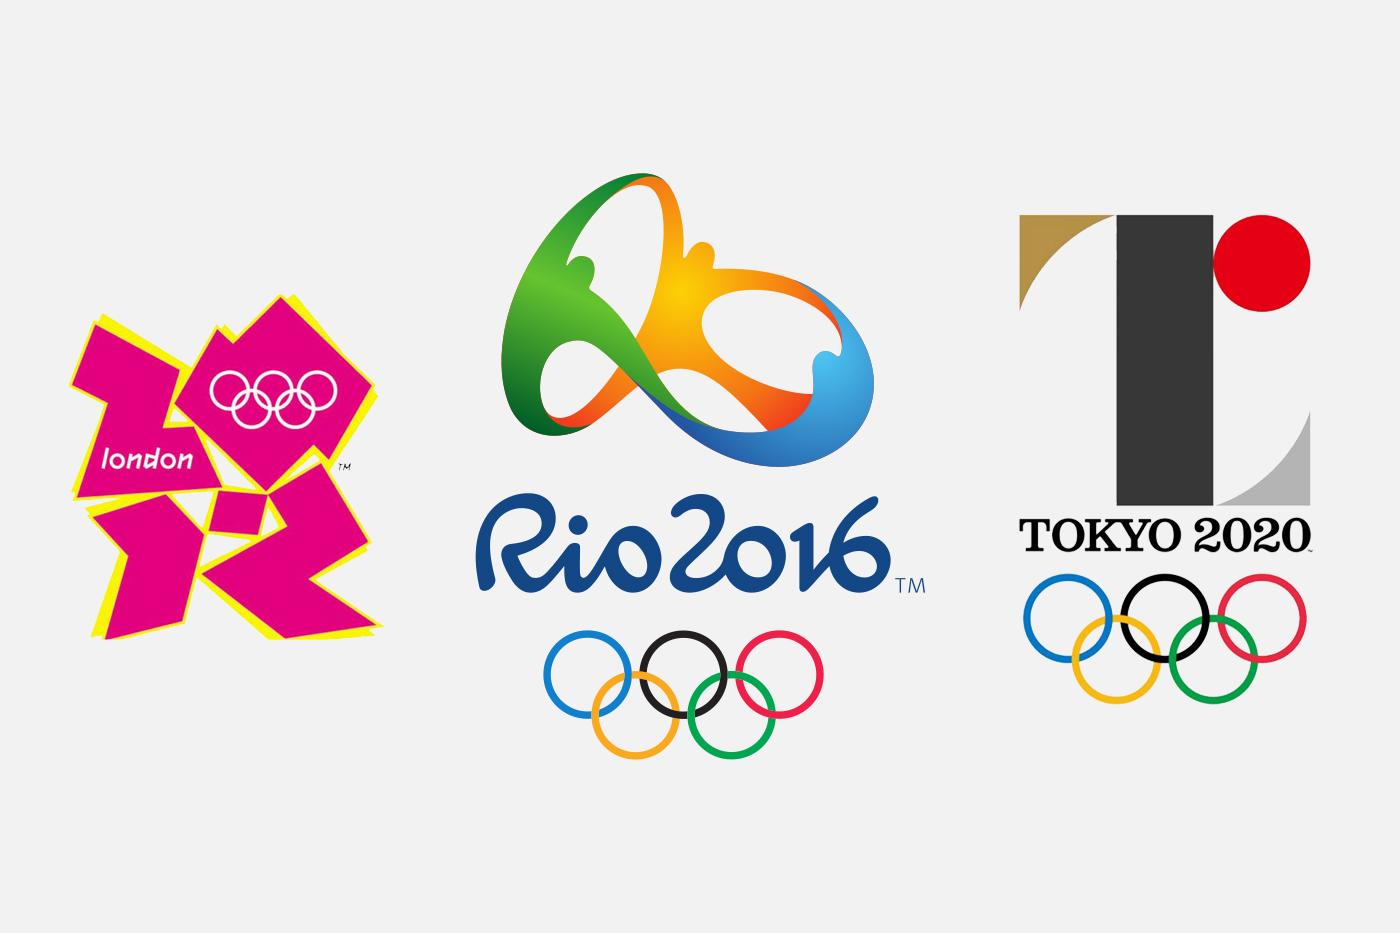 Olympic rings 2020